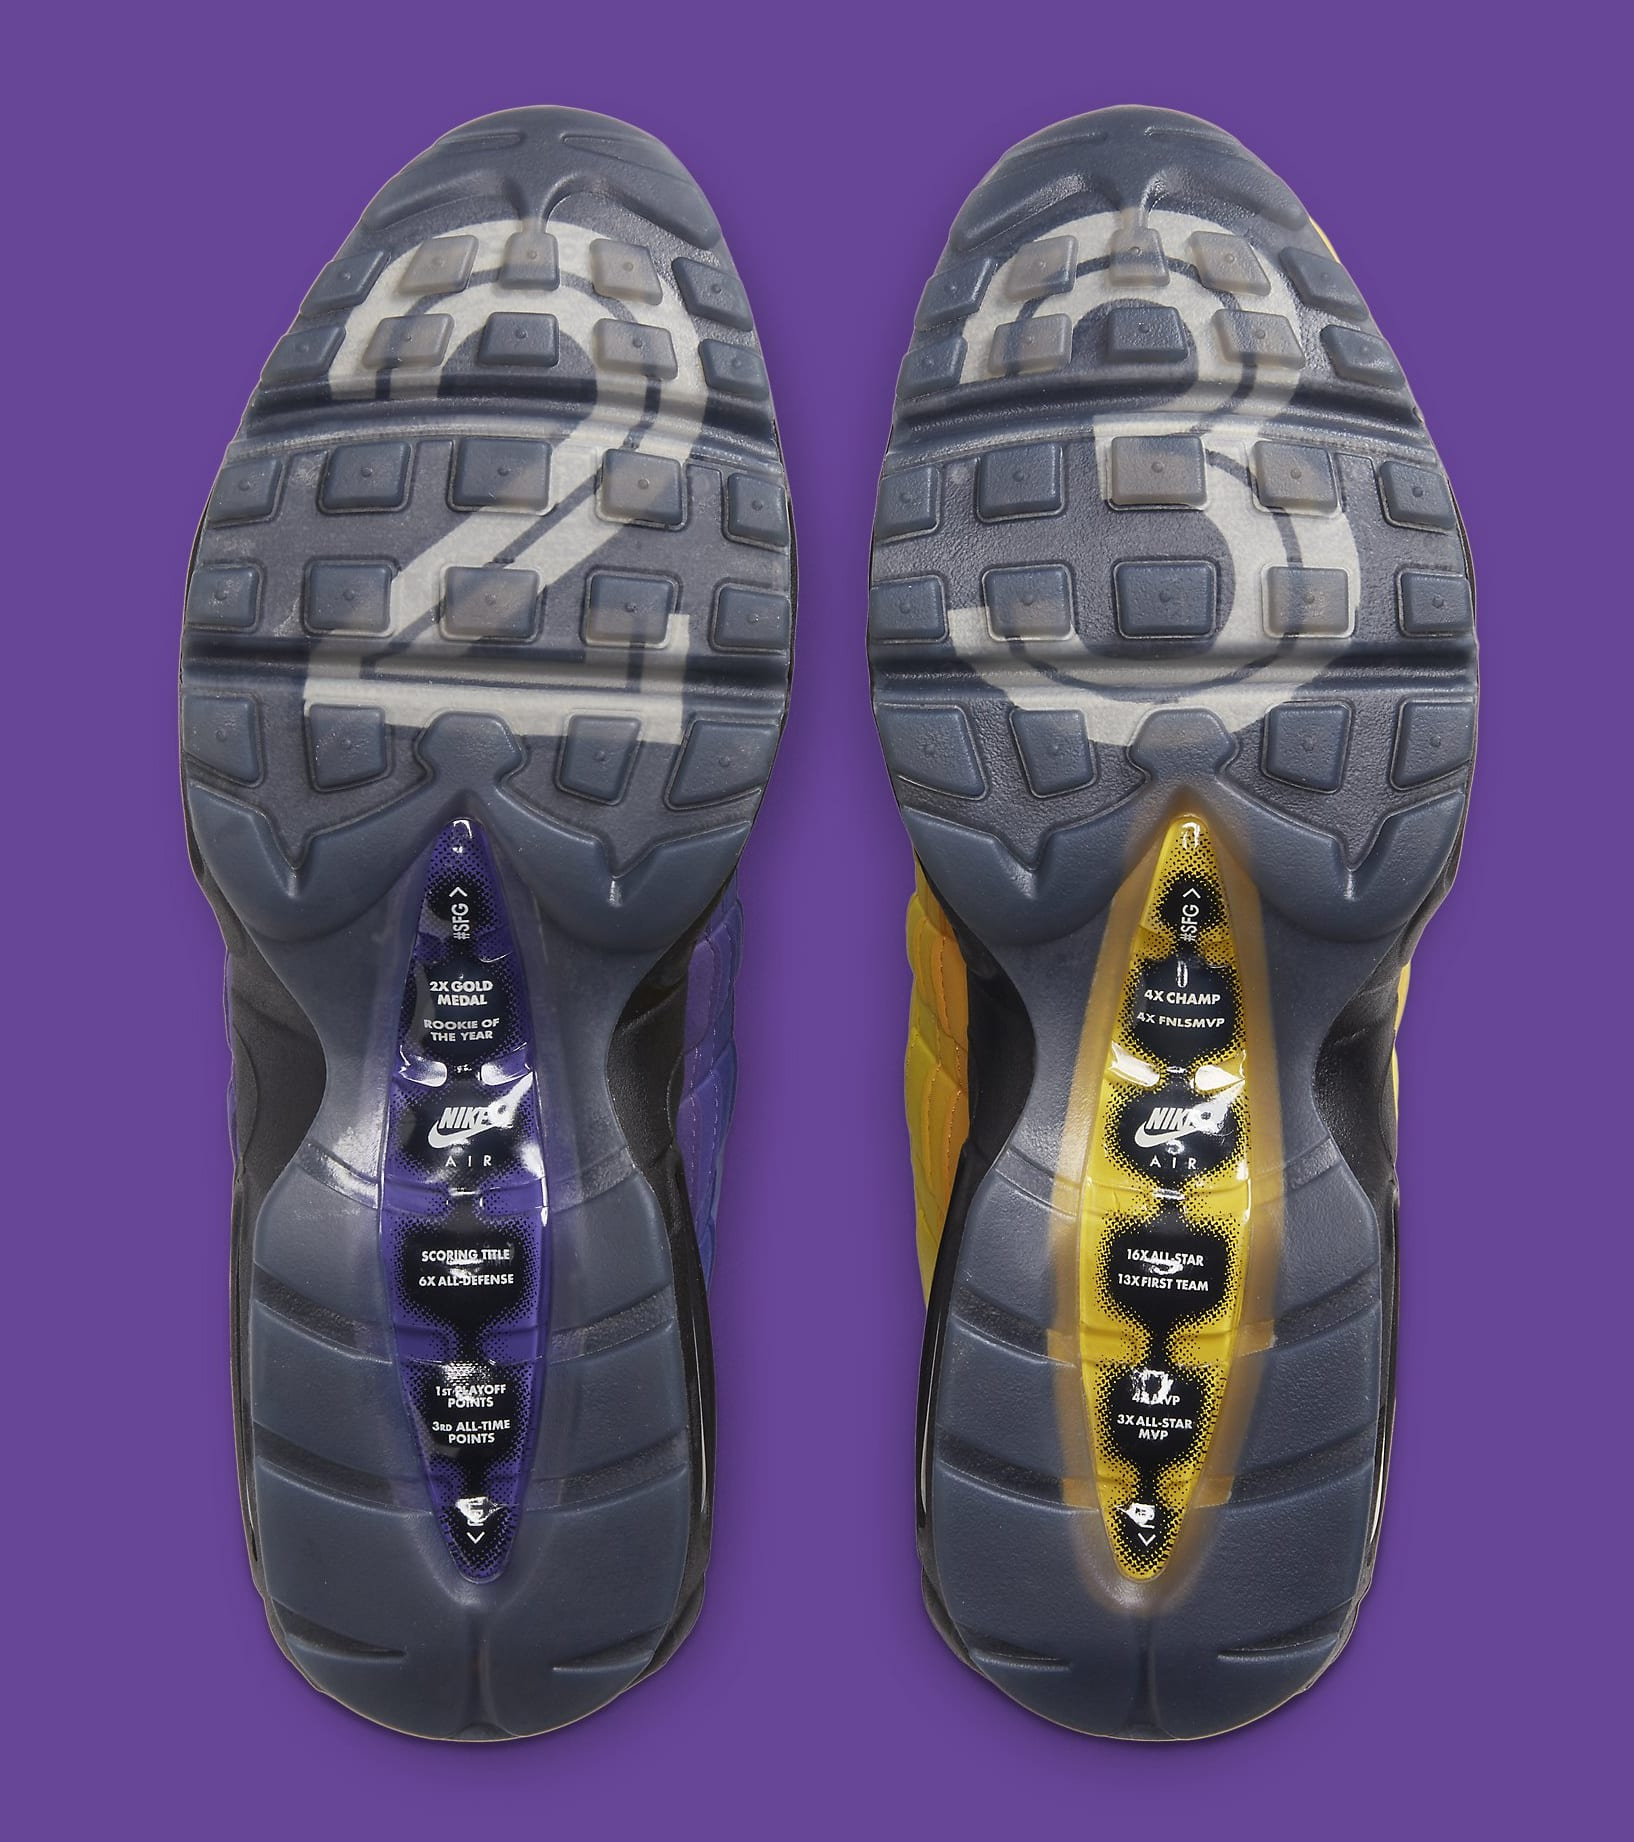 Nike Air Max 95 'LeBron' CZ3624-001 Outsole